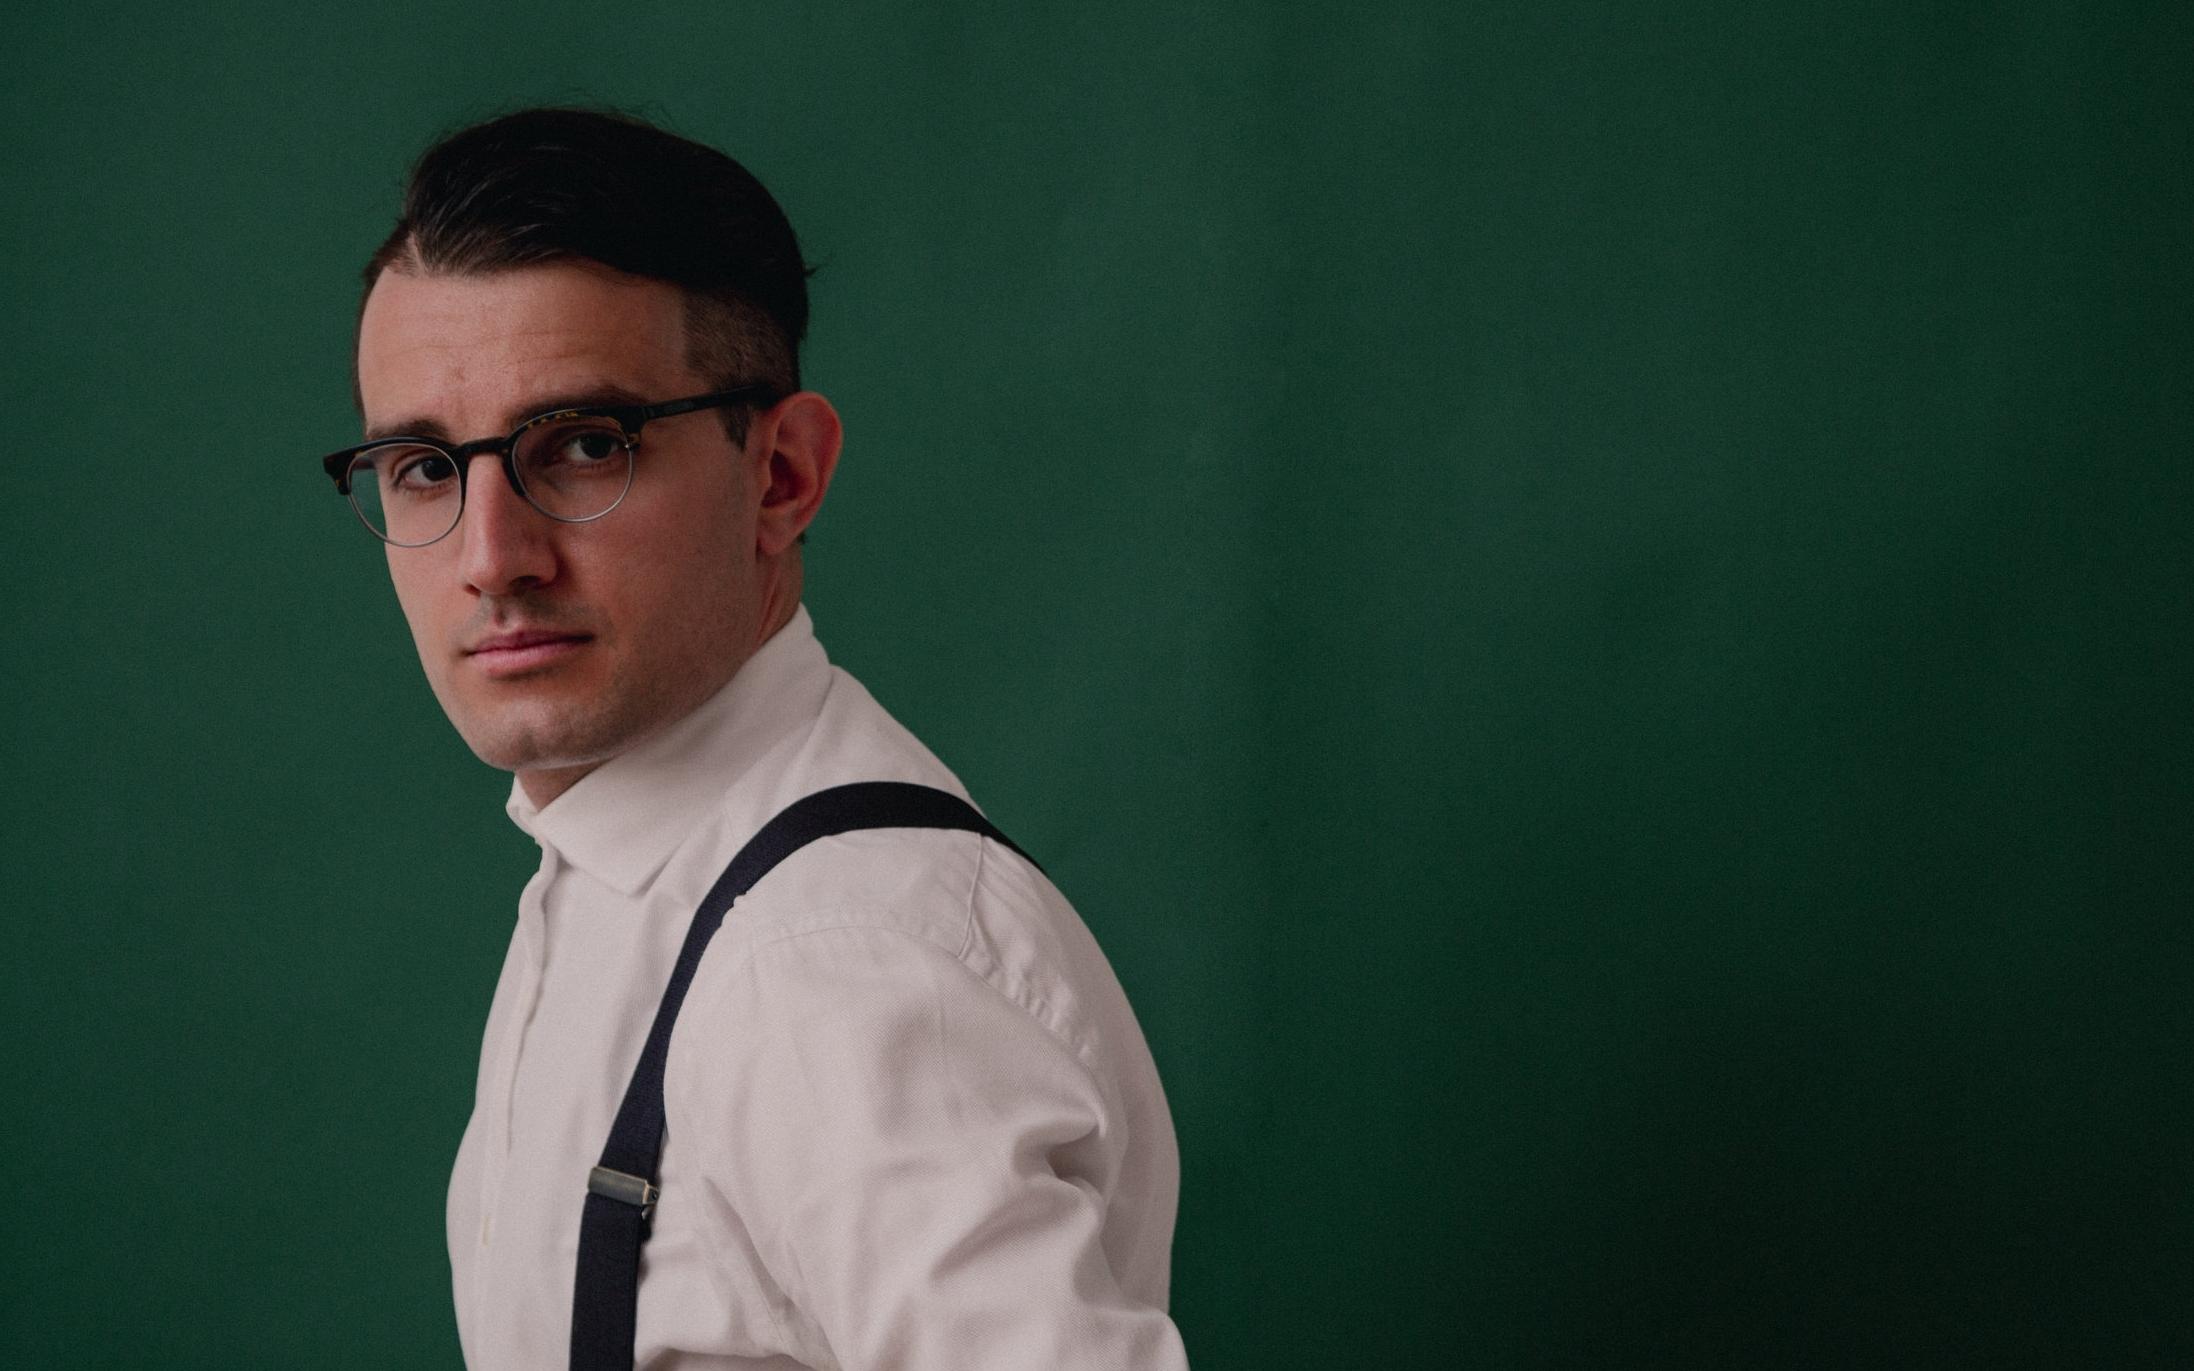 Stefan Vladimirov - Chief Creative Officer at Swipes